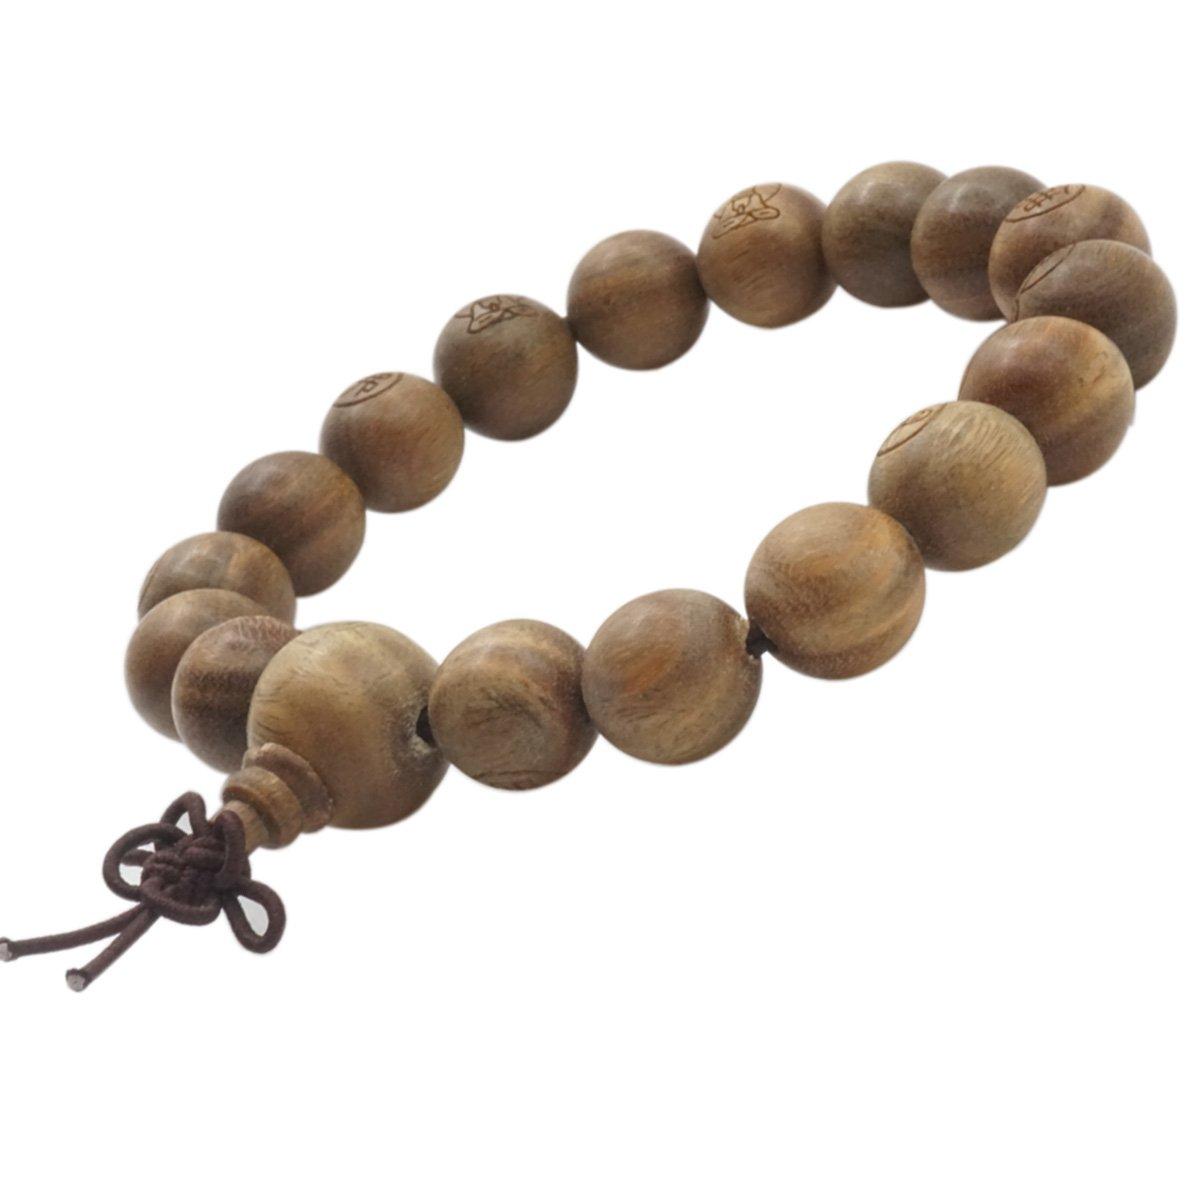 12mm Sandalwood Beads Bracelet Wrist Tibetan Meditation Buddhist Prayer Mala Elastic Bracelet Mayting MTB002